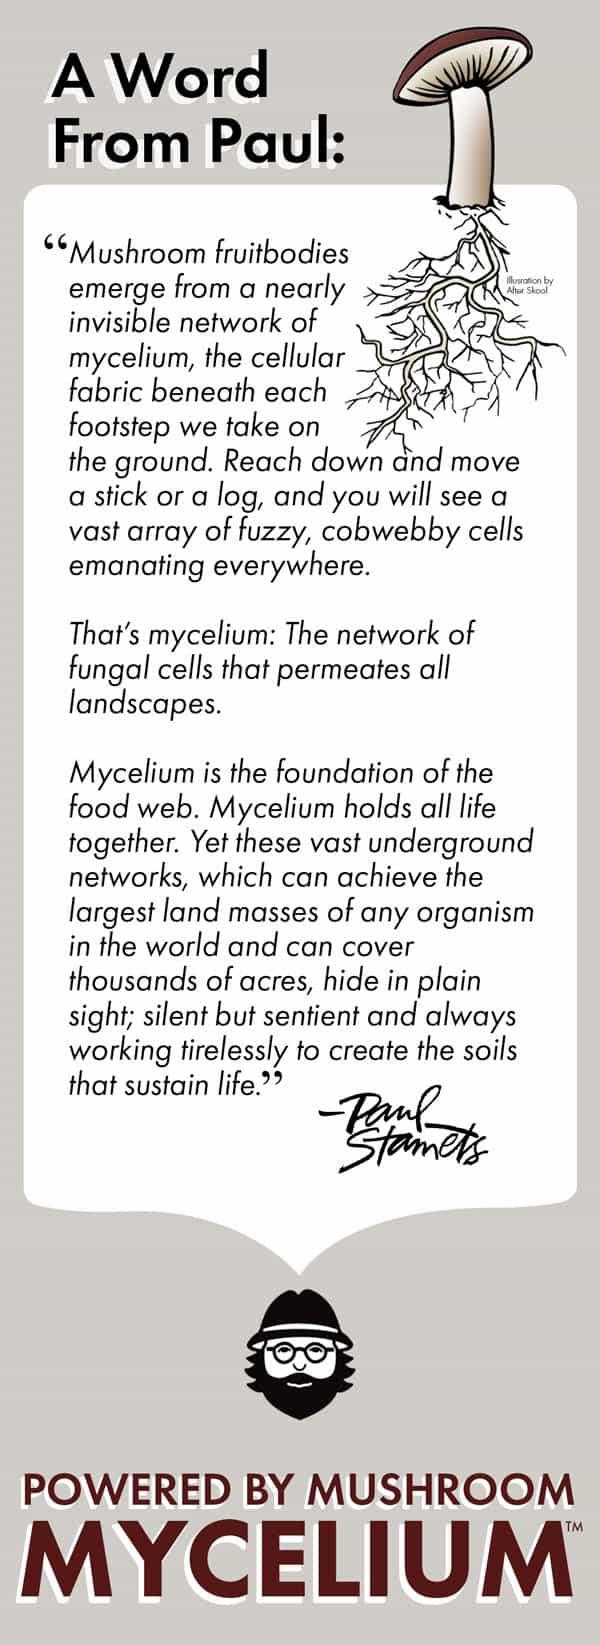 A Word About Mushroom Mycelium